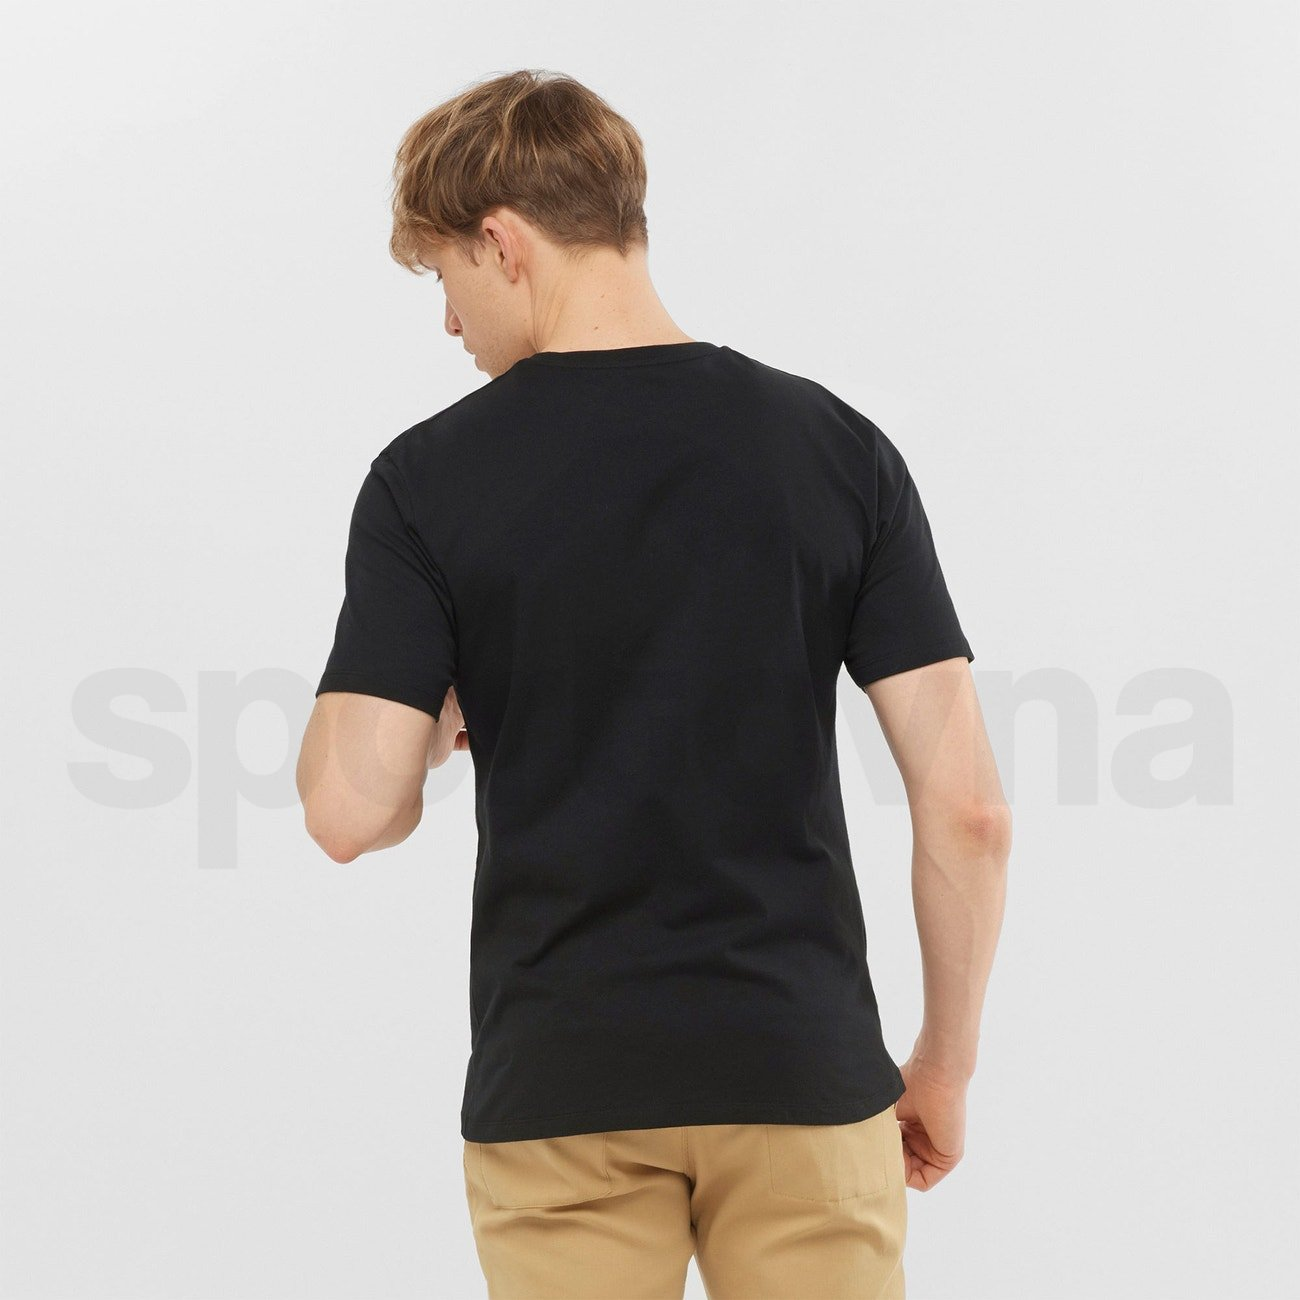 Tričko Salomon OUTLIFE GRAPHIC SPEEDCROS M - černá